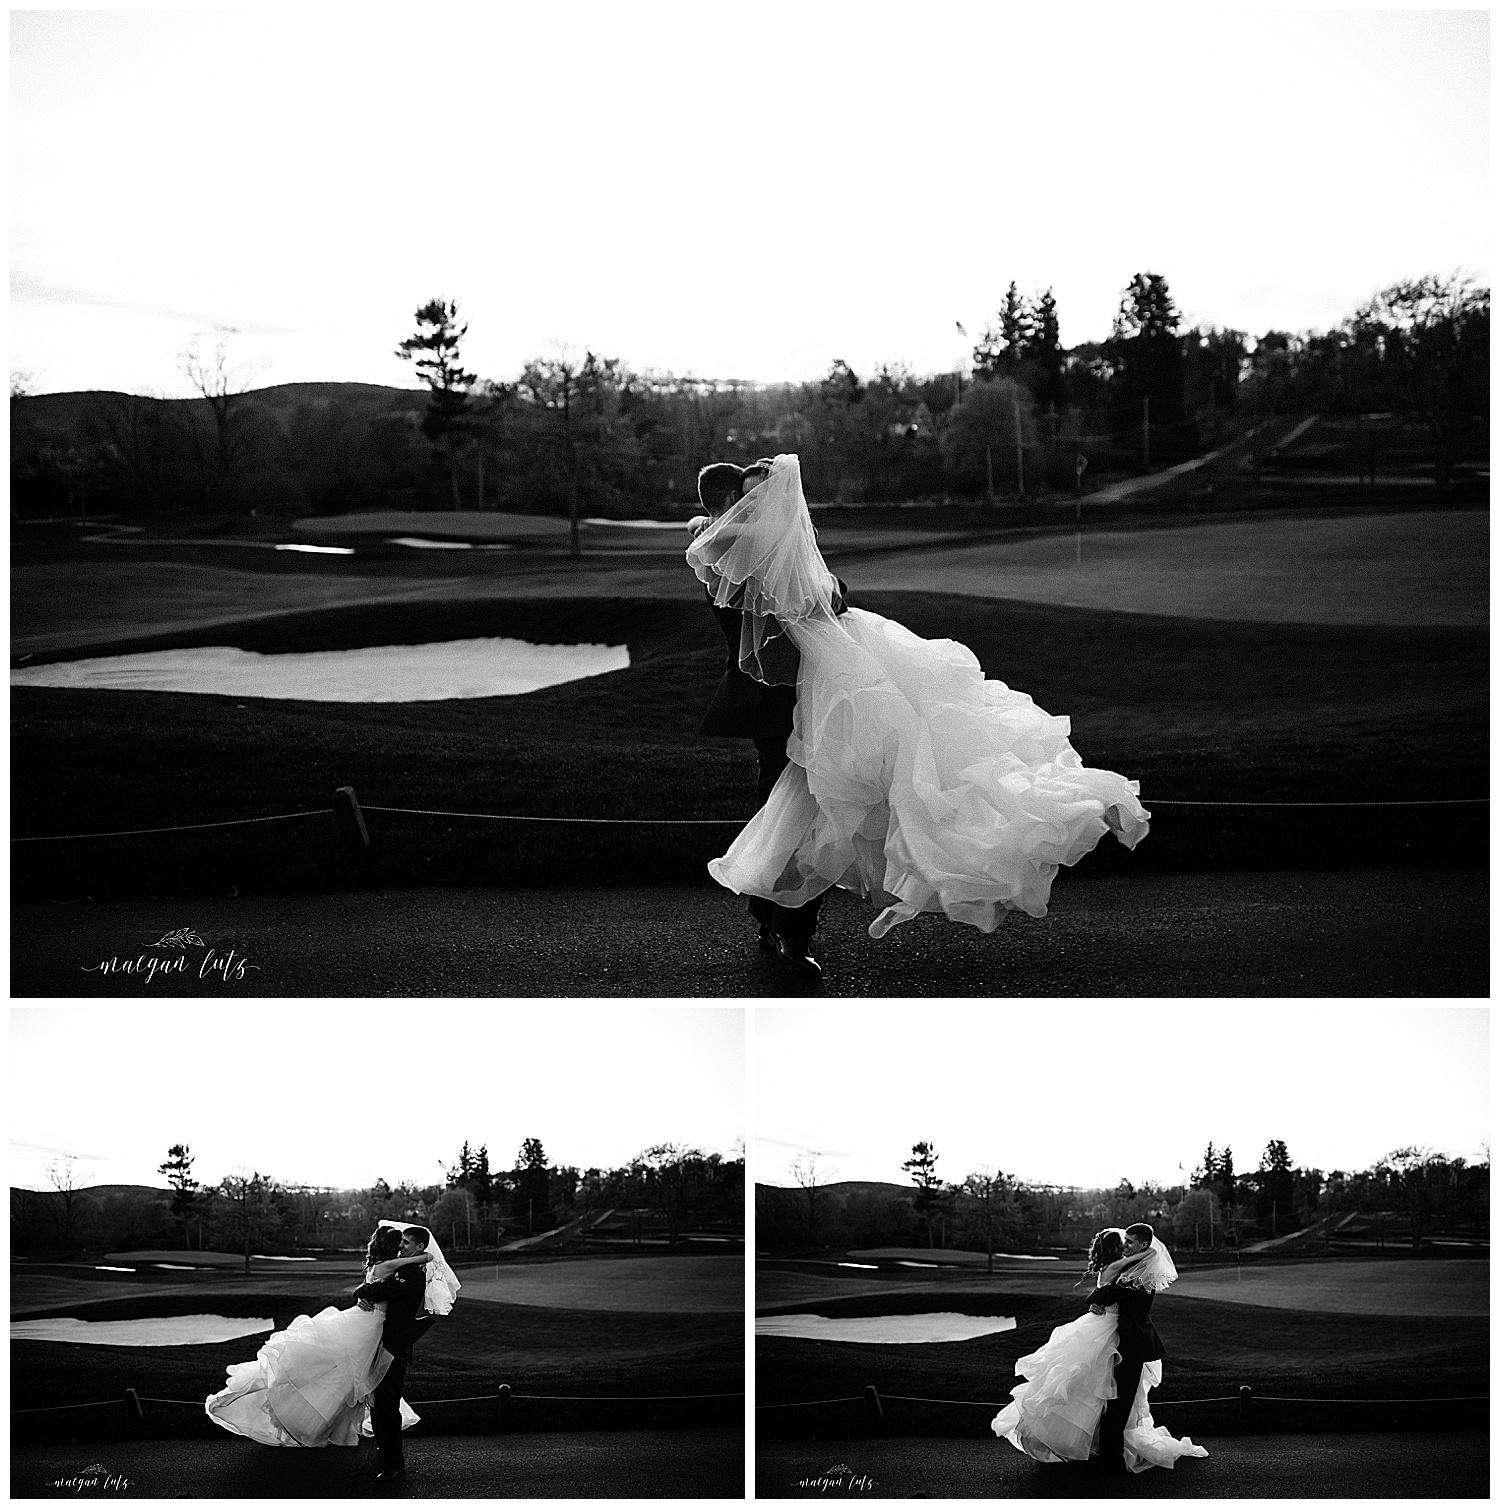 NEPA-Lehigh-Valley-Wedding-Photographer-at-Glen-Oak-Country-Club-Clarks-Summit-PA_0071.jpg